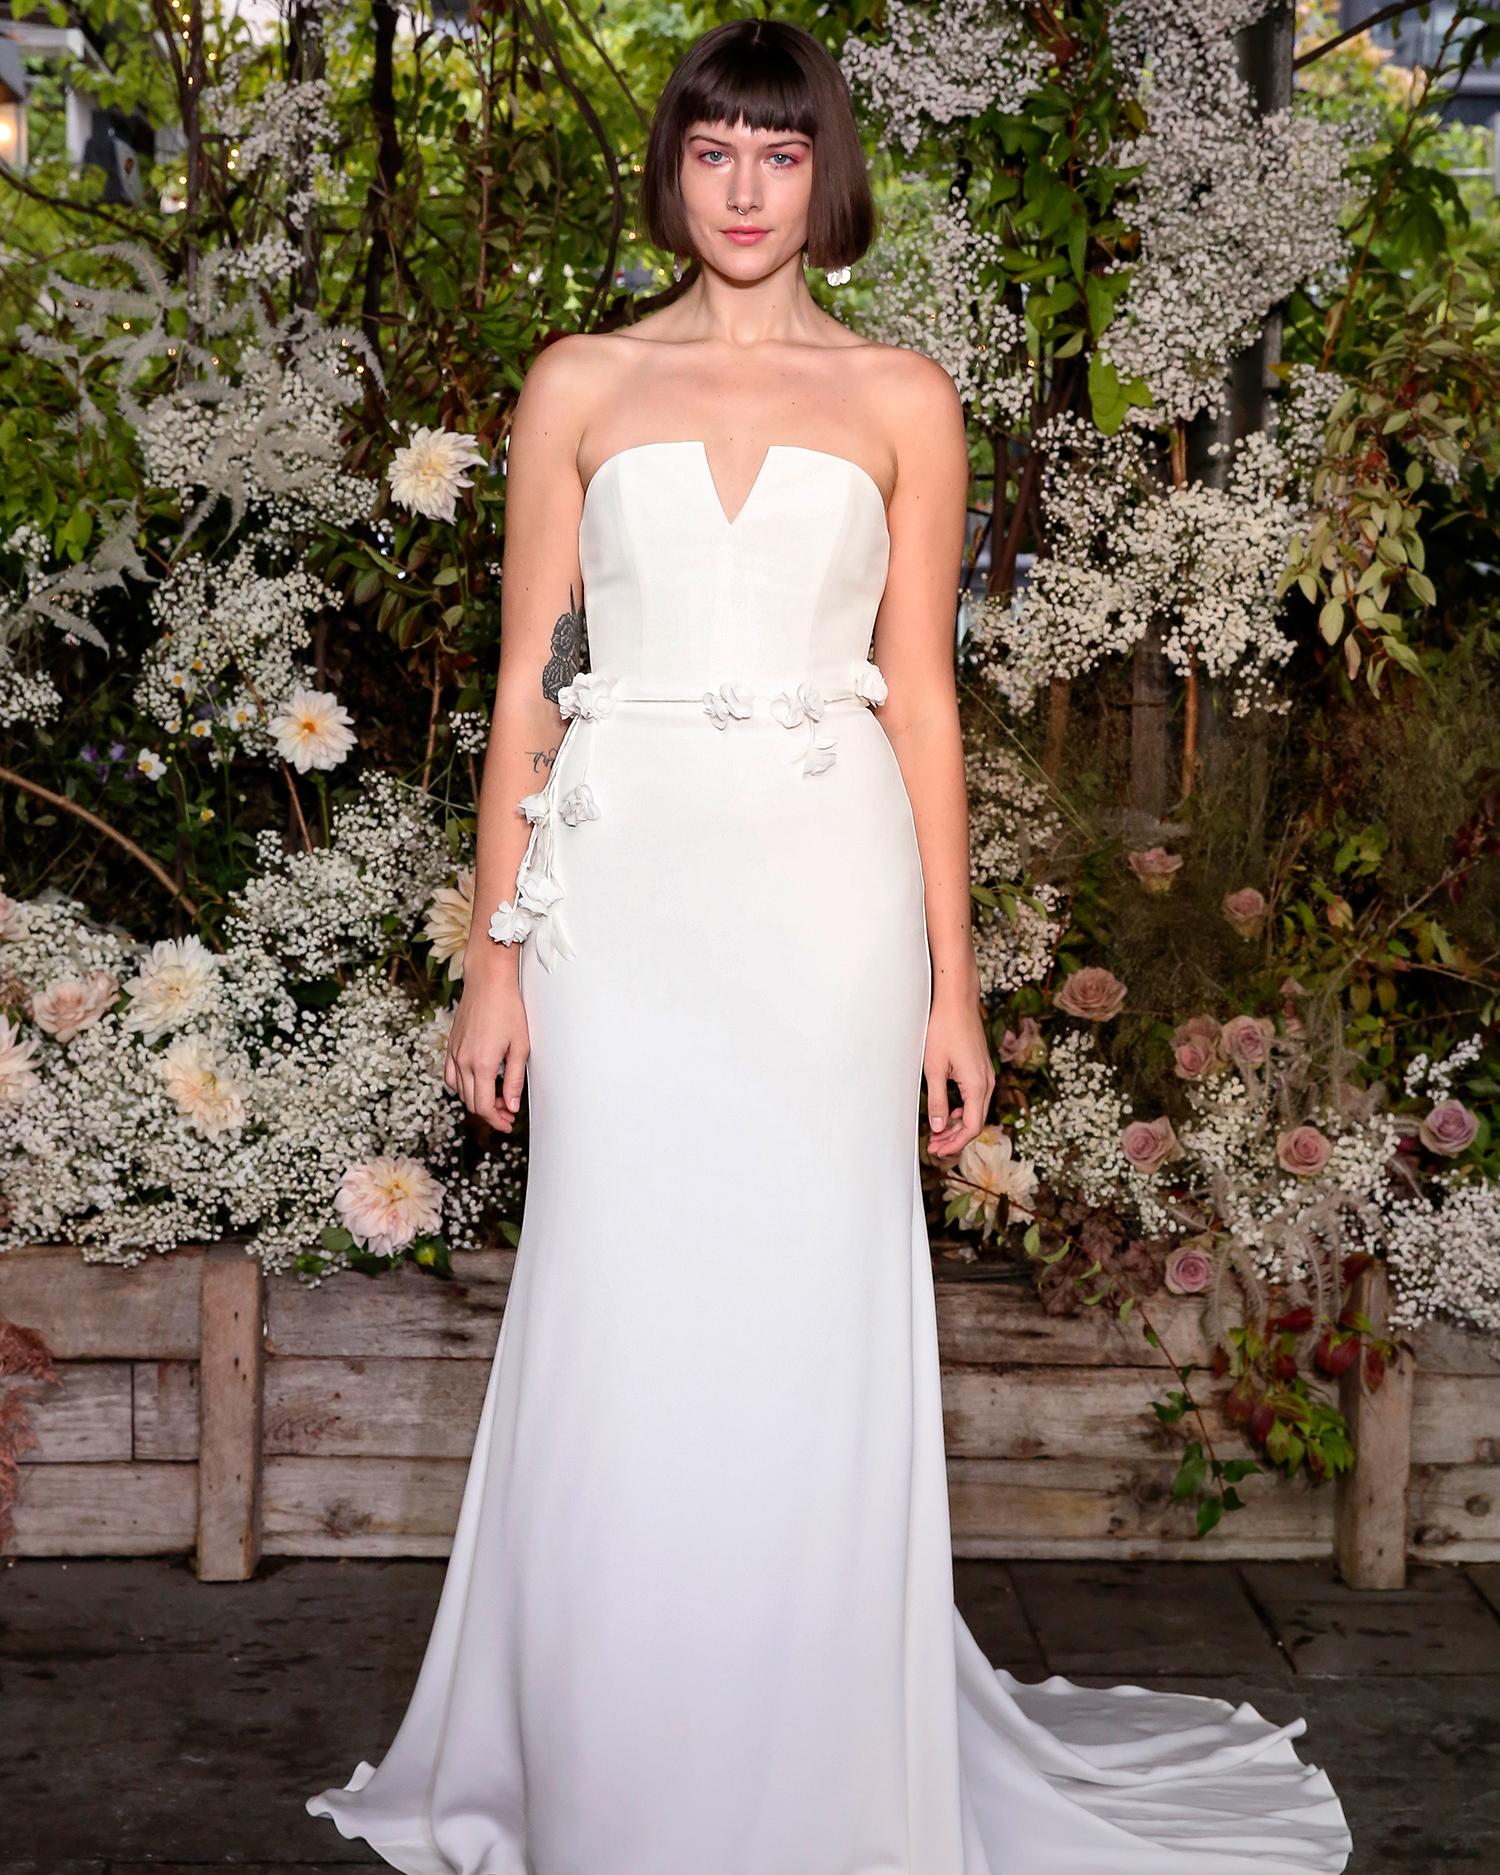 alexandra grecco wedding dress notched neckline with floral belt